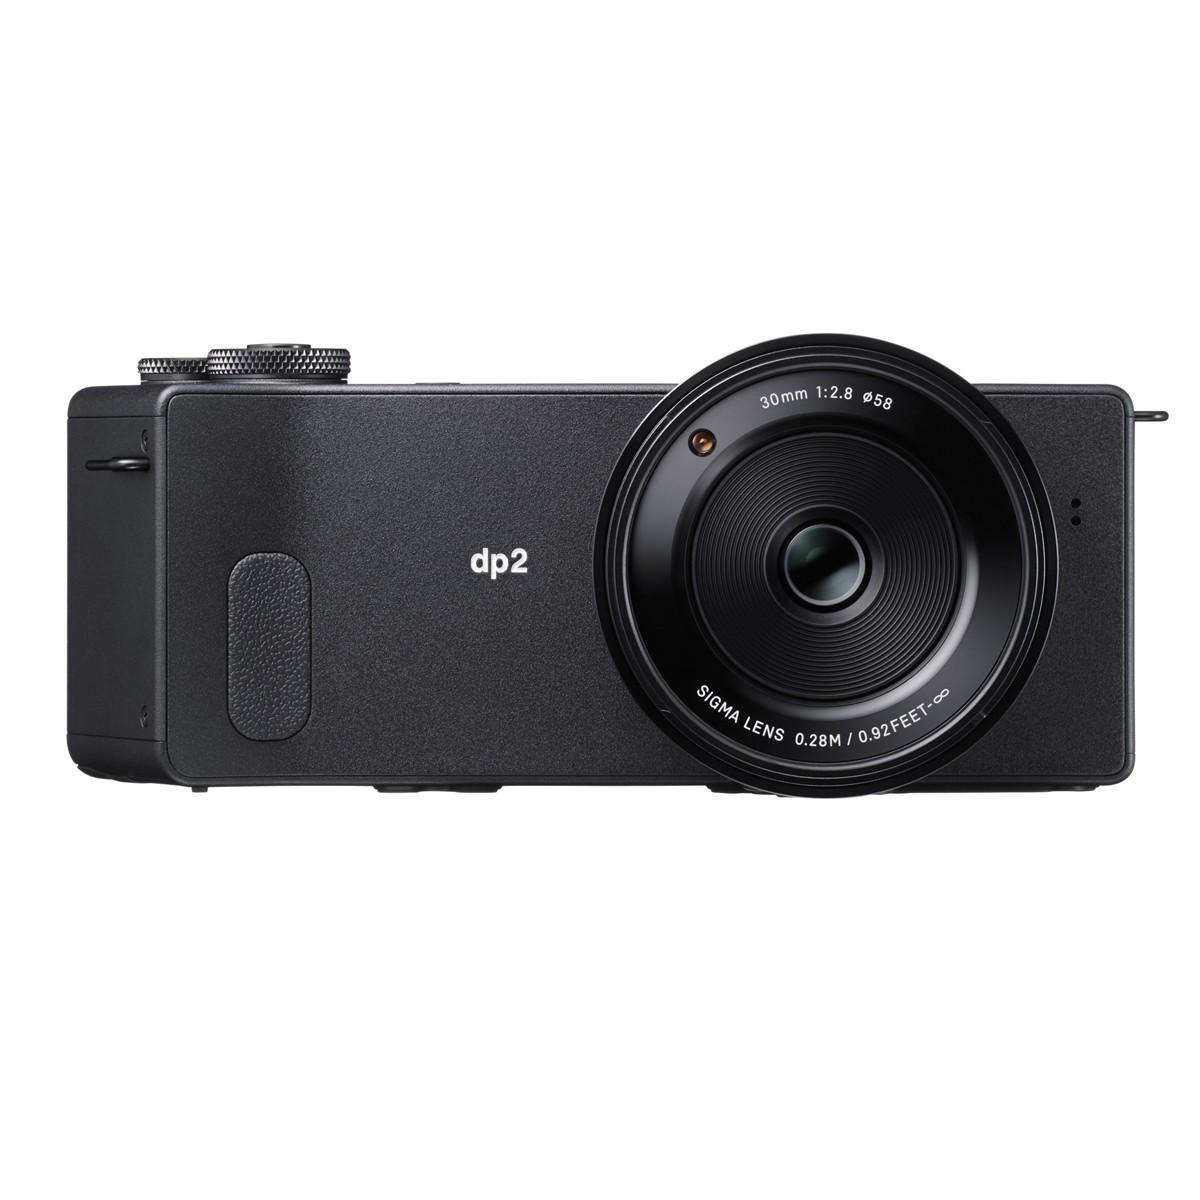 dp2-quattro-compact-digital-camera-c81900-179